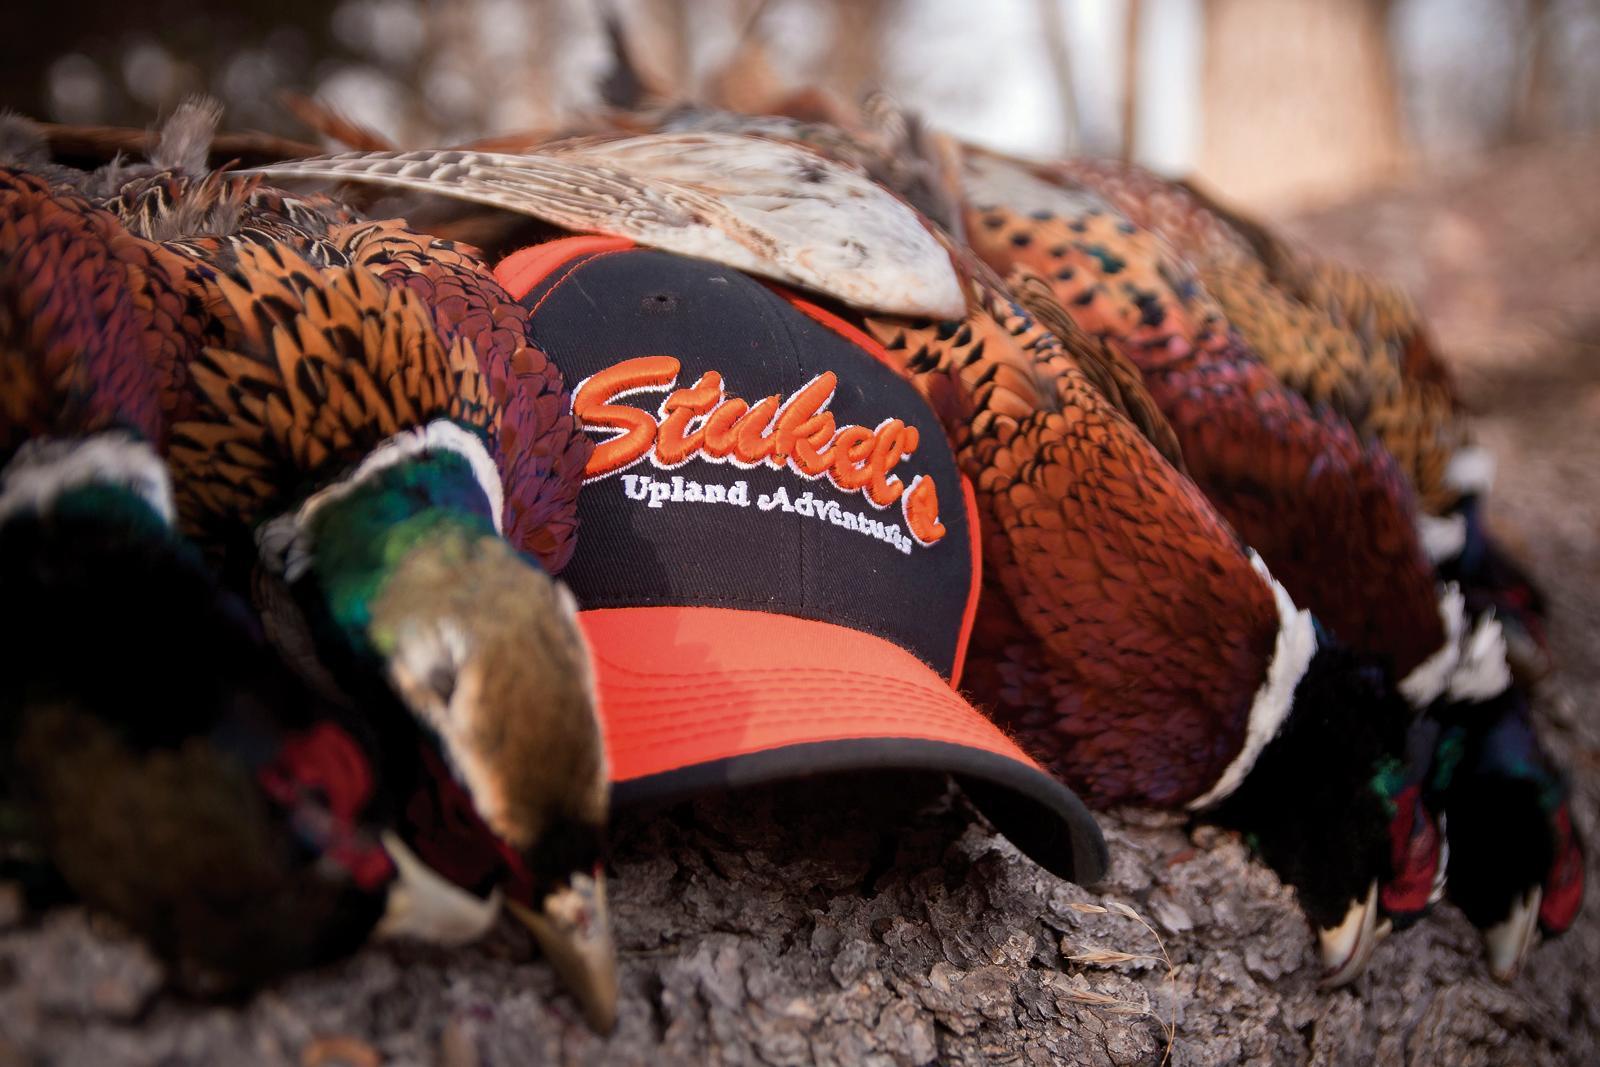 Stukel's Birds & Bucks